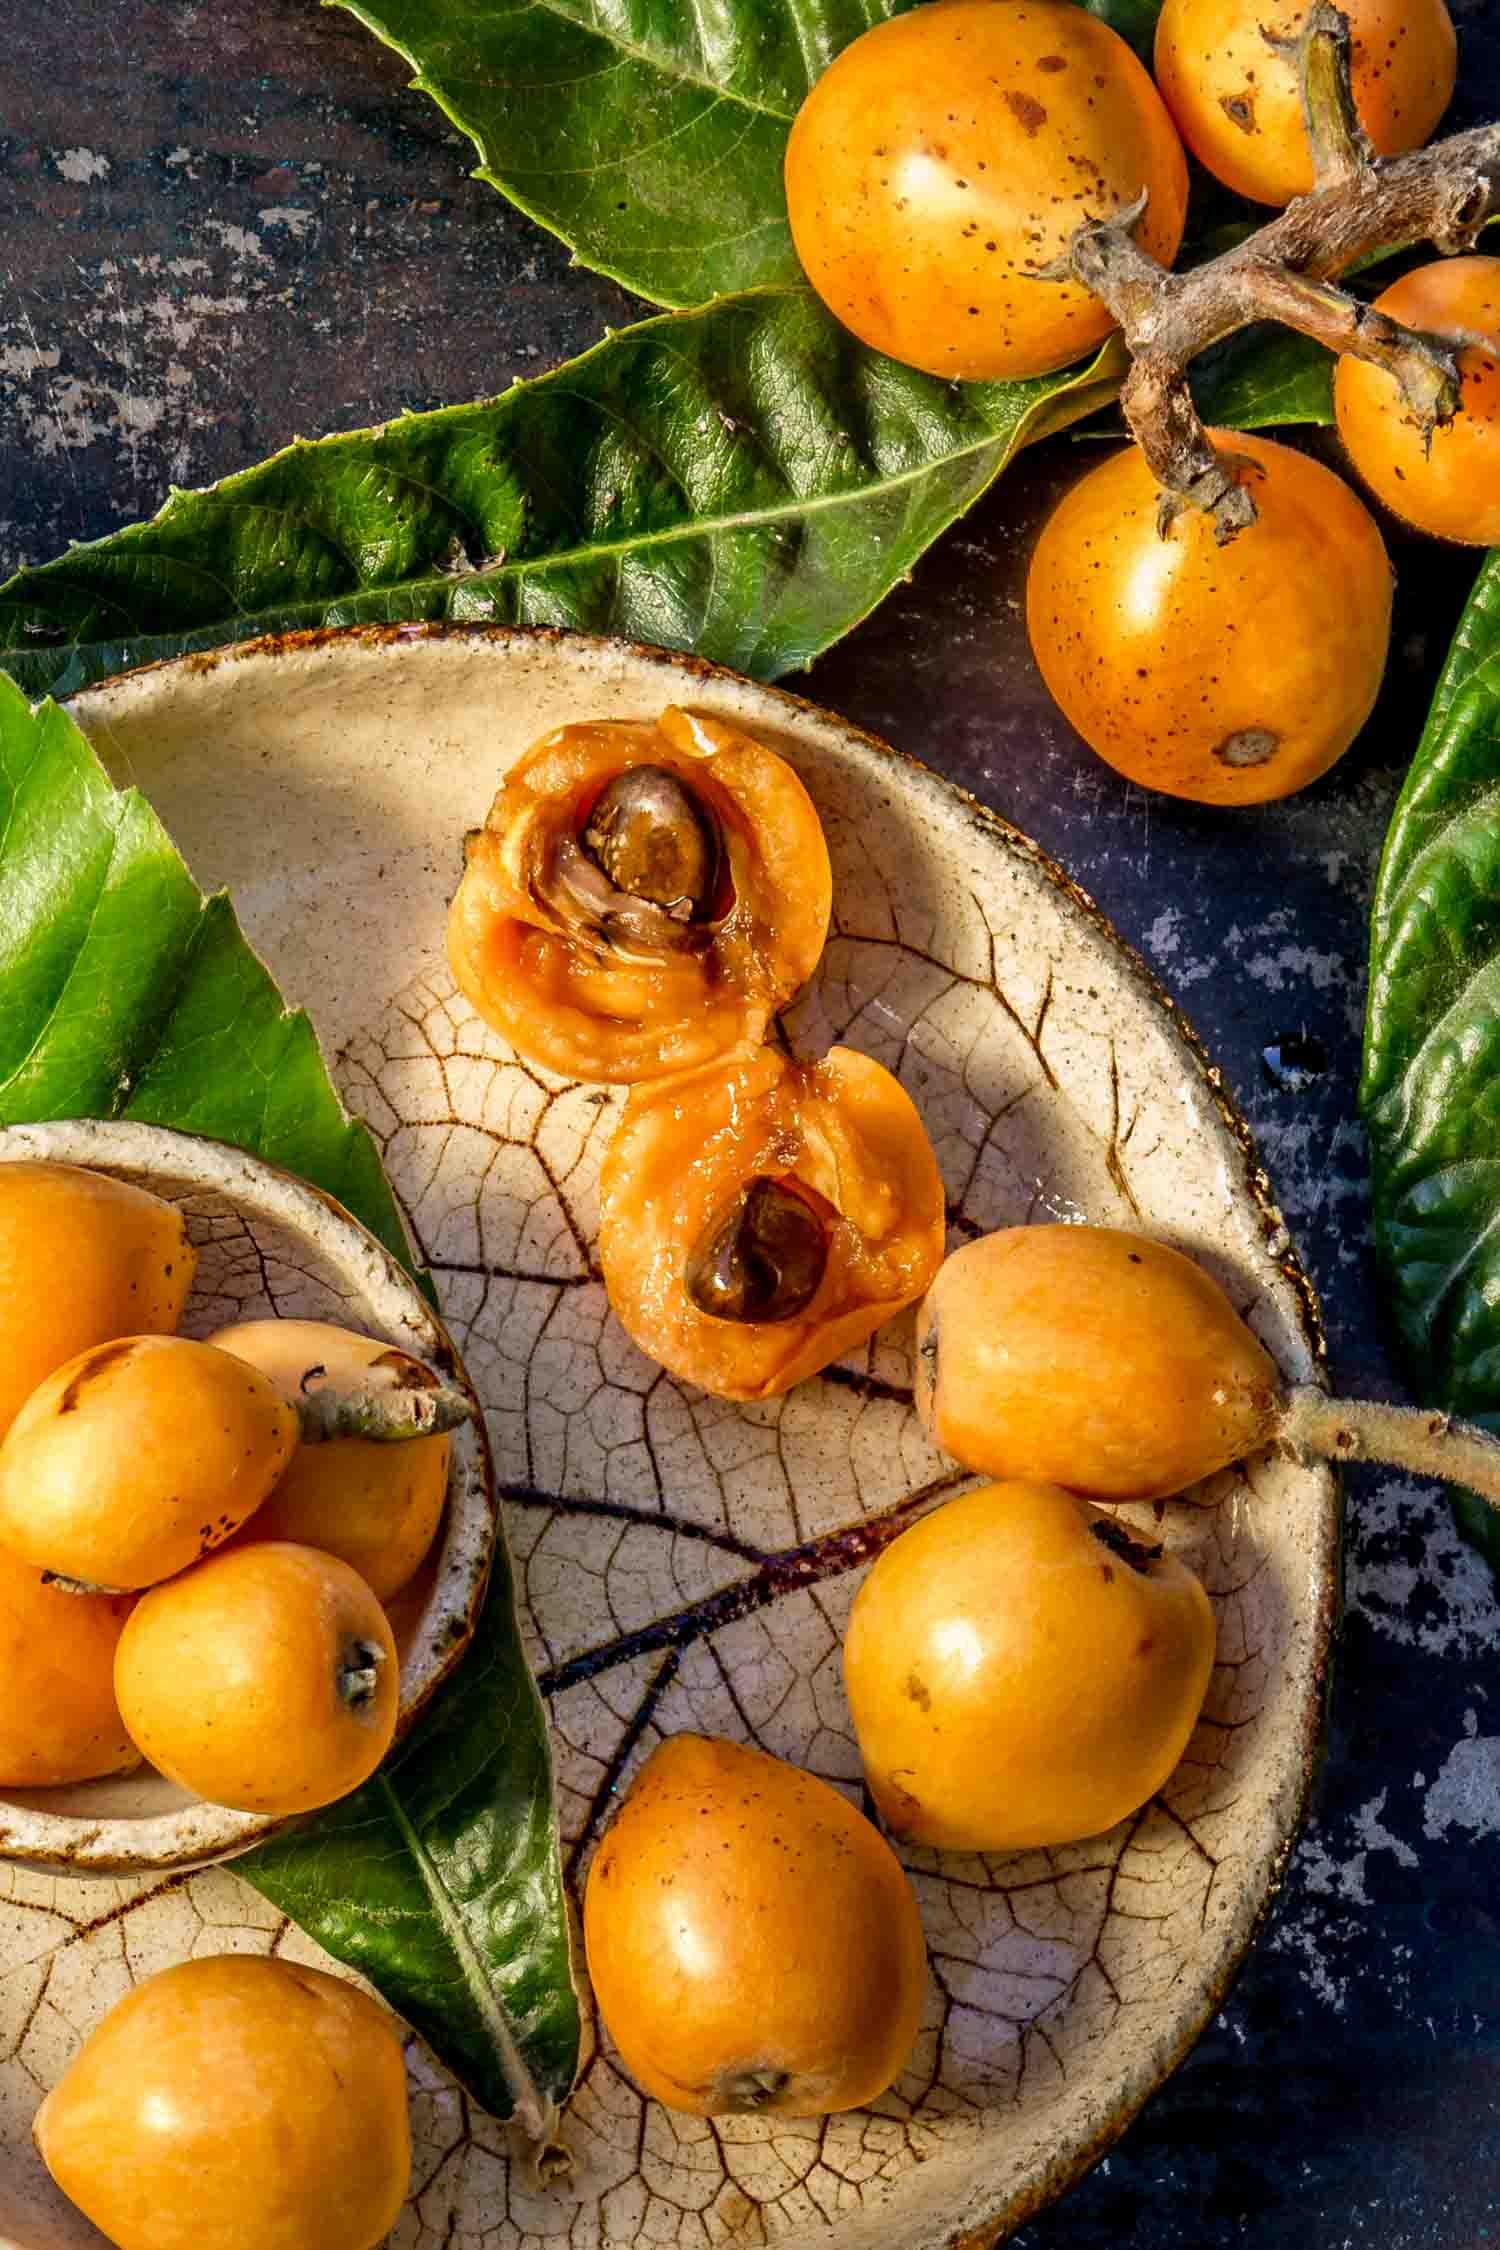 Loquat fruit. Nispero in Ecuador. Eriobotrya Japonica. Loquat with fresh leaves on metal background.